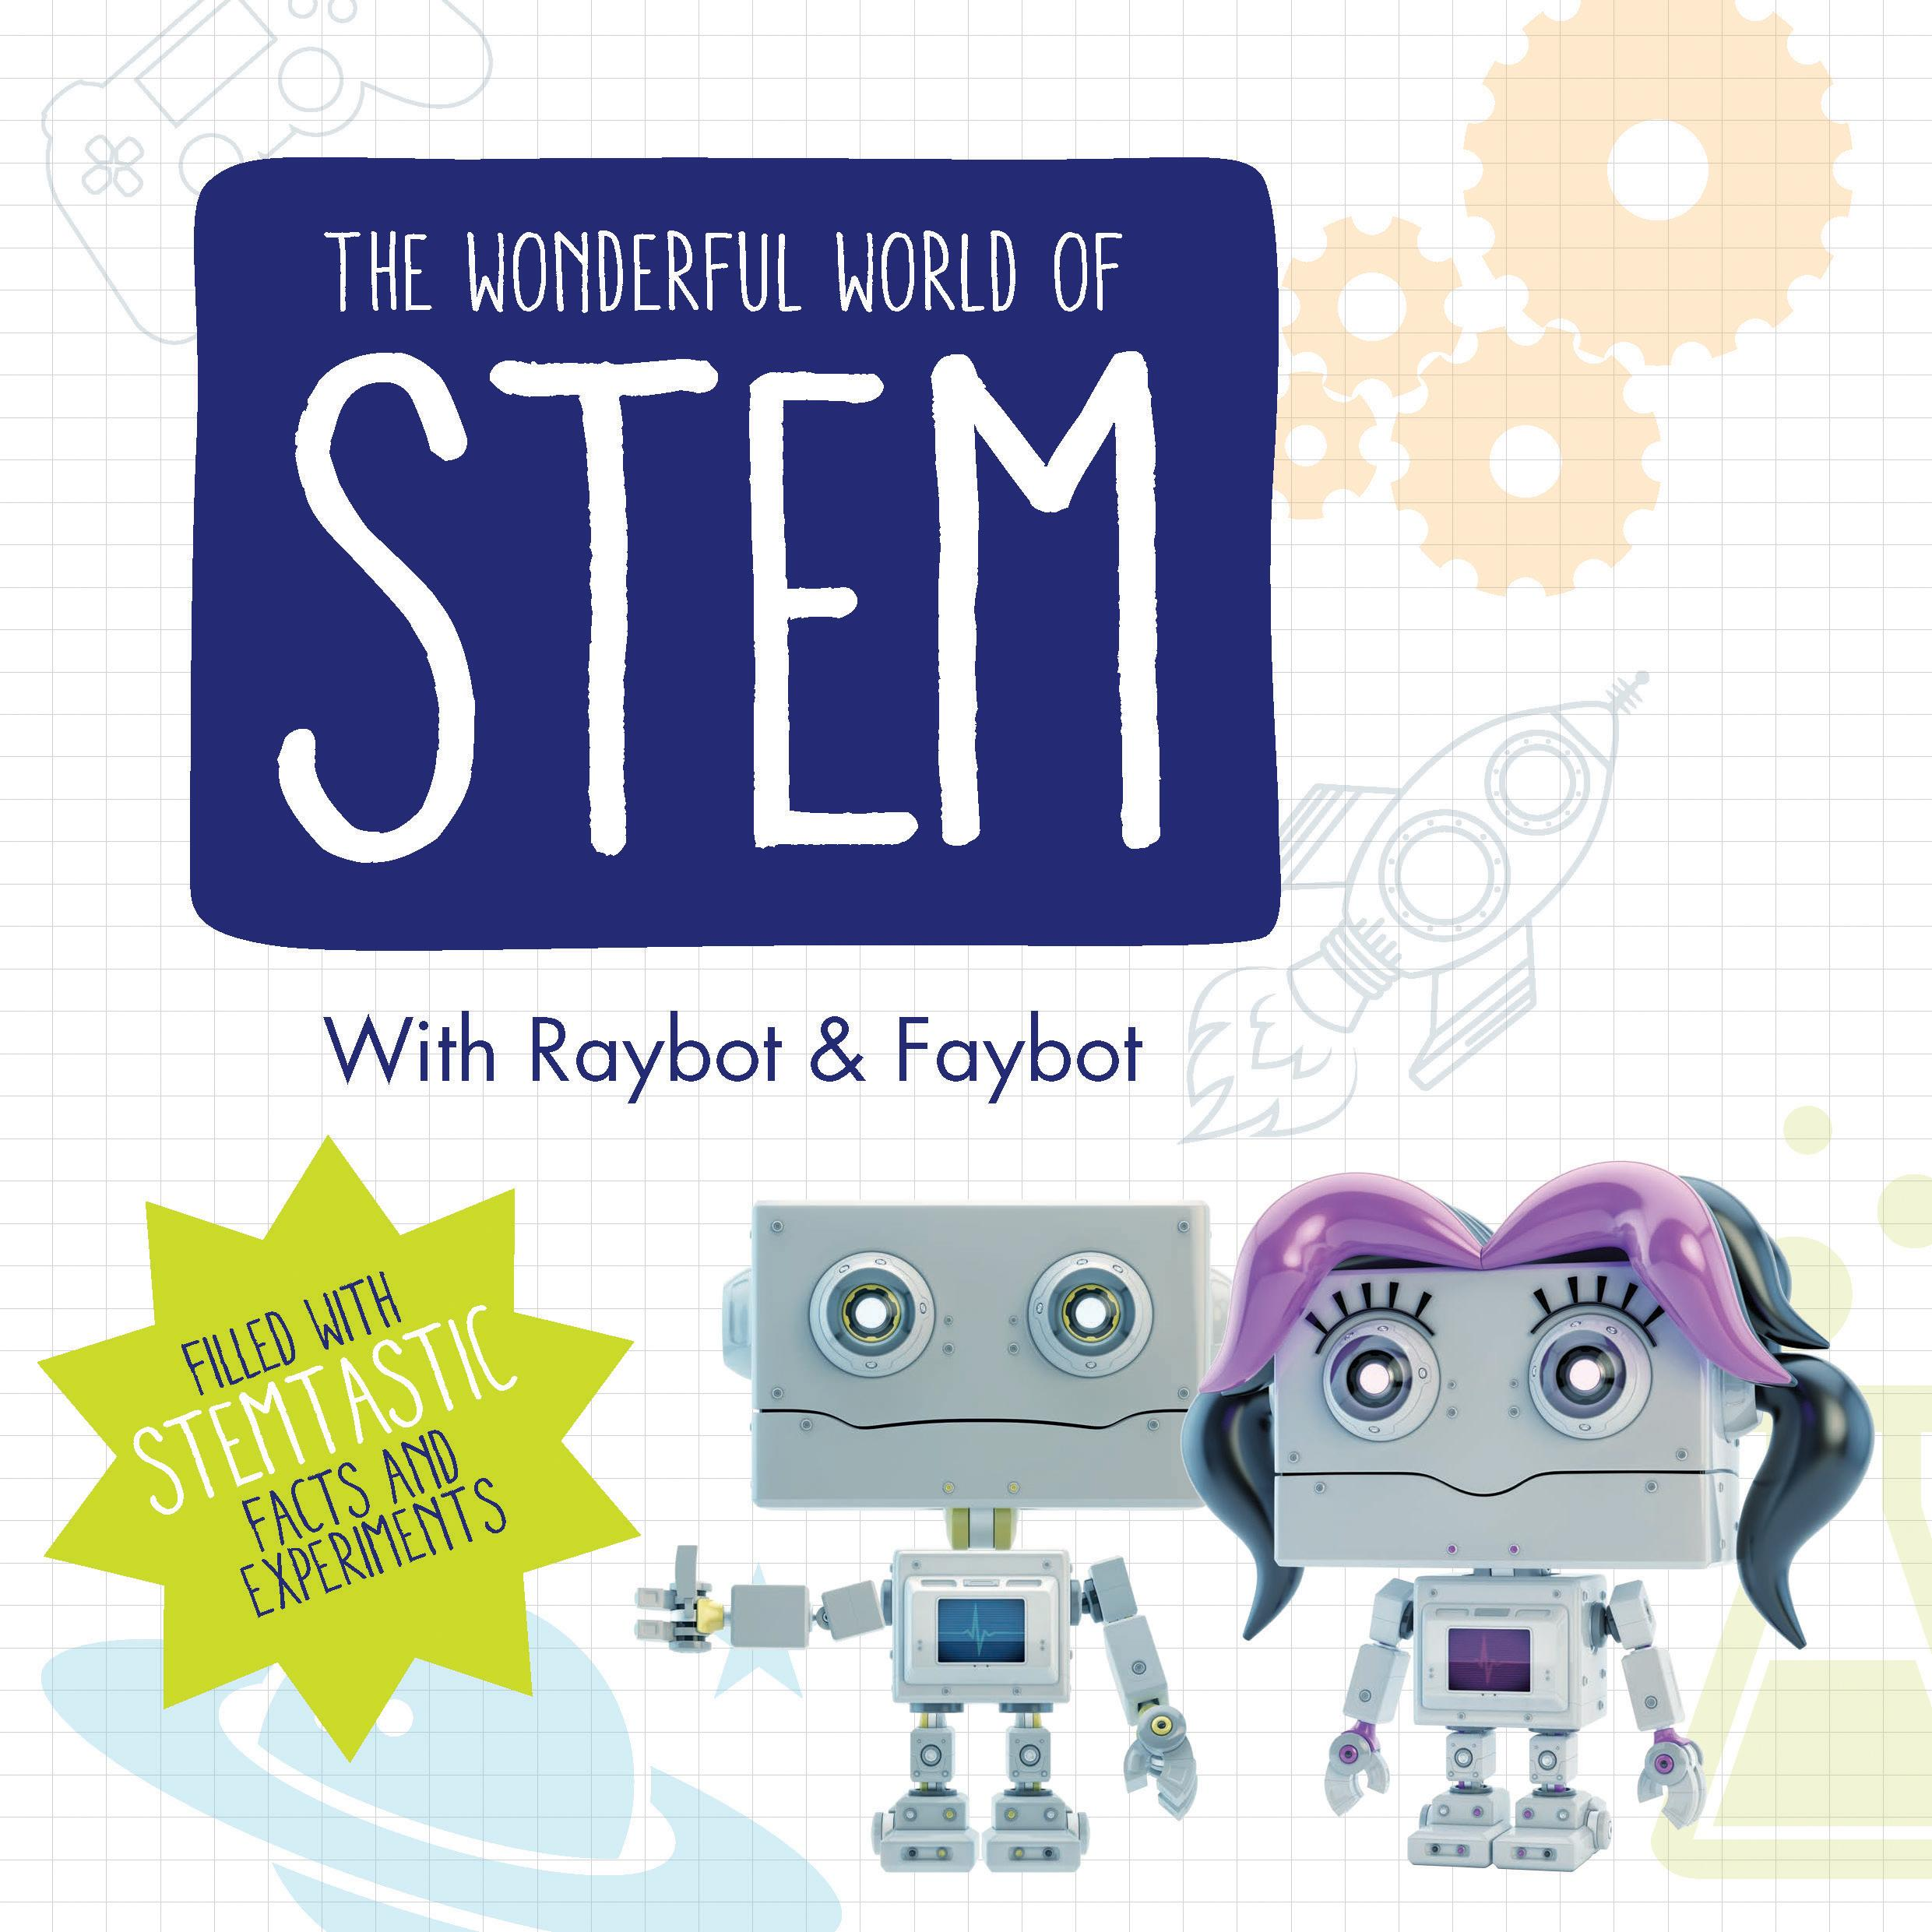 World Stem School: STEM Education And Outreach